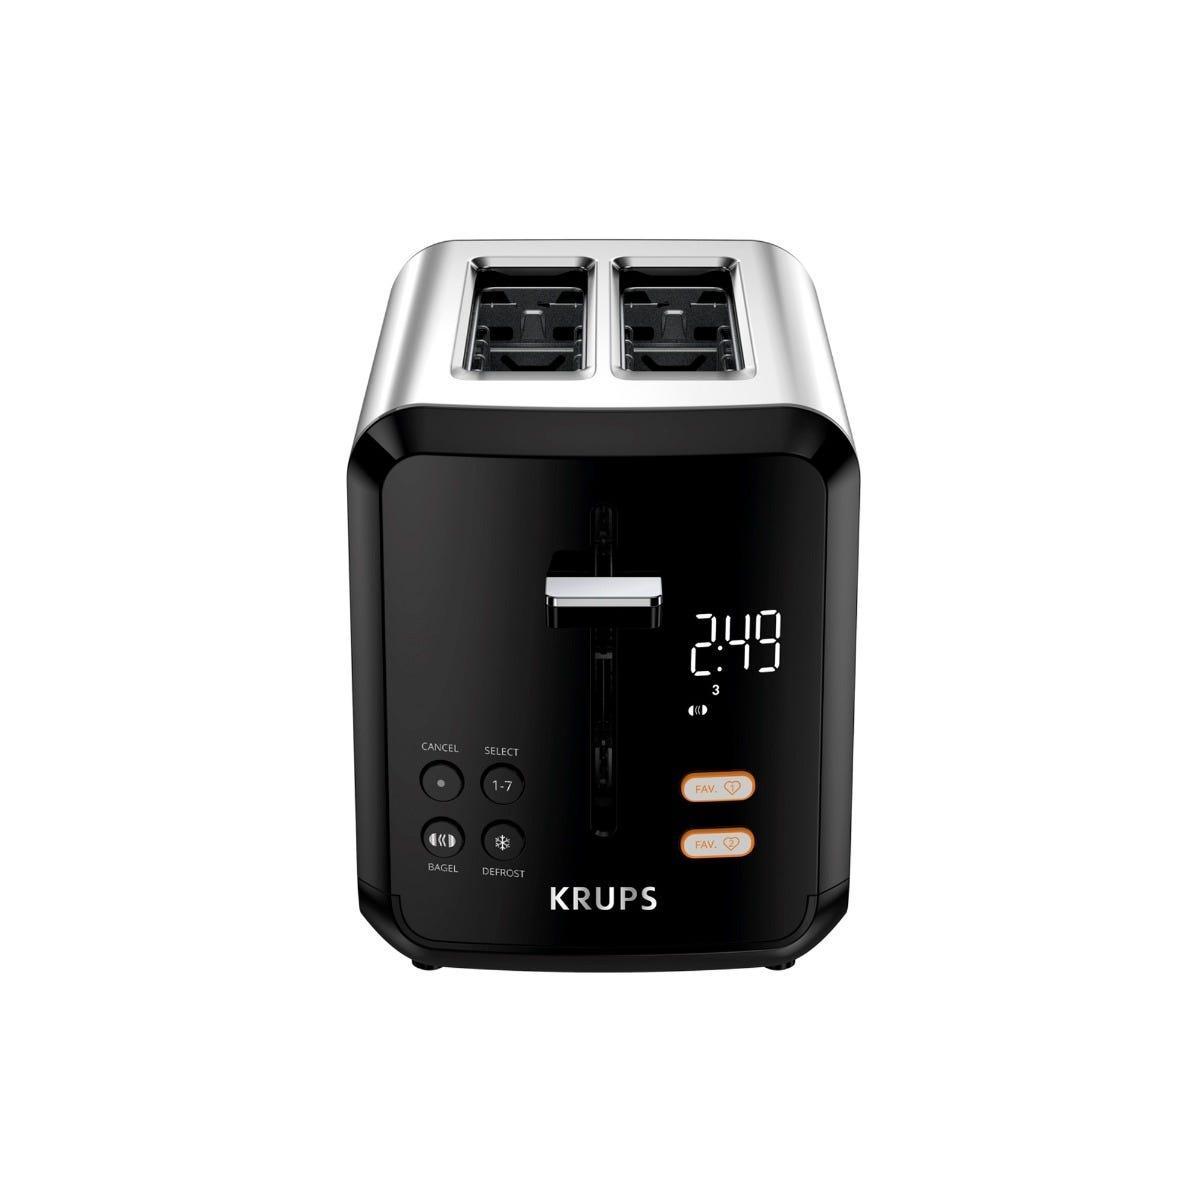 Tostador digital Krups® para 2 rebanadas en negro